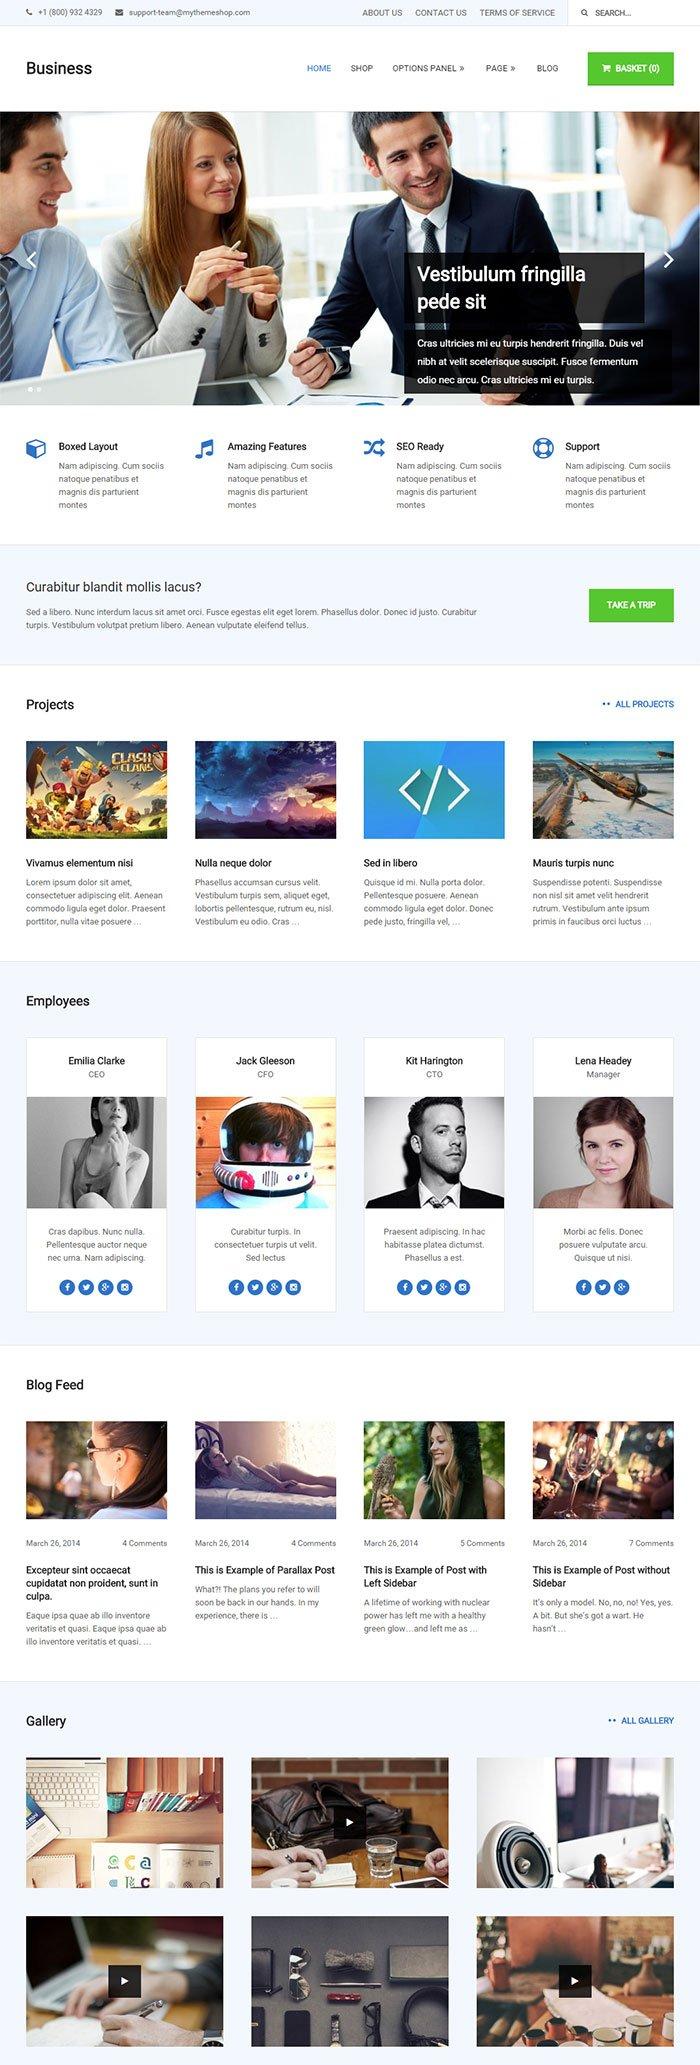 Best Premium WordPress Business Theme